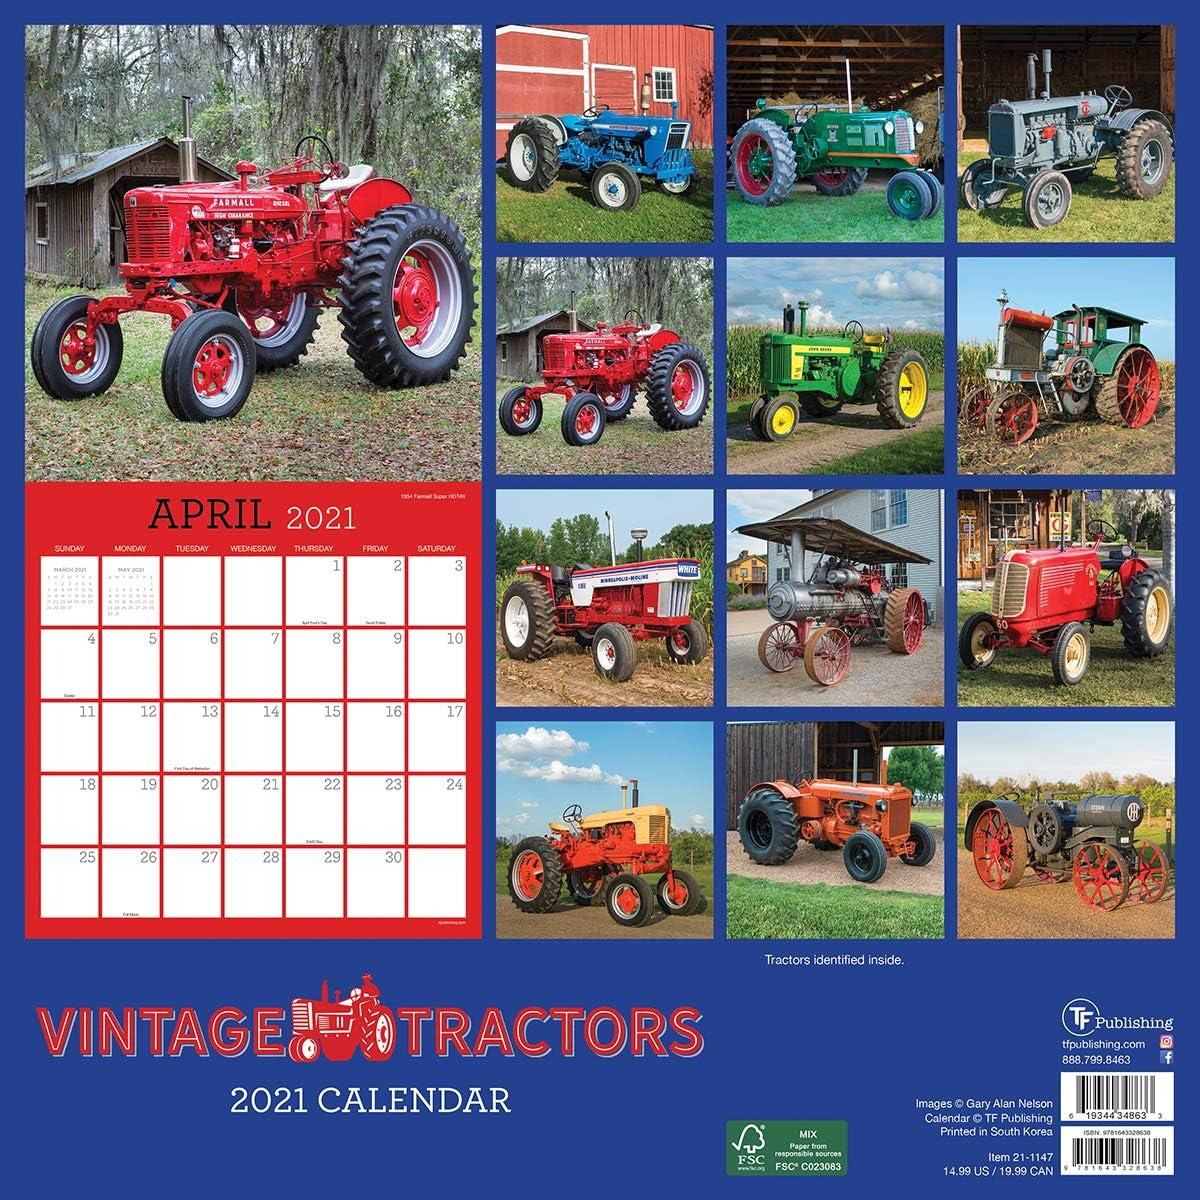 Vintage Tractors Wall Calendar 2021 by Carousel Calendars 210215